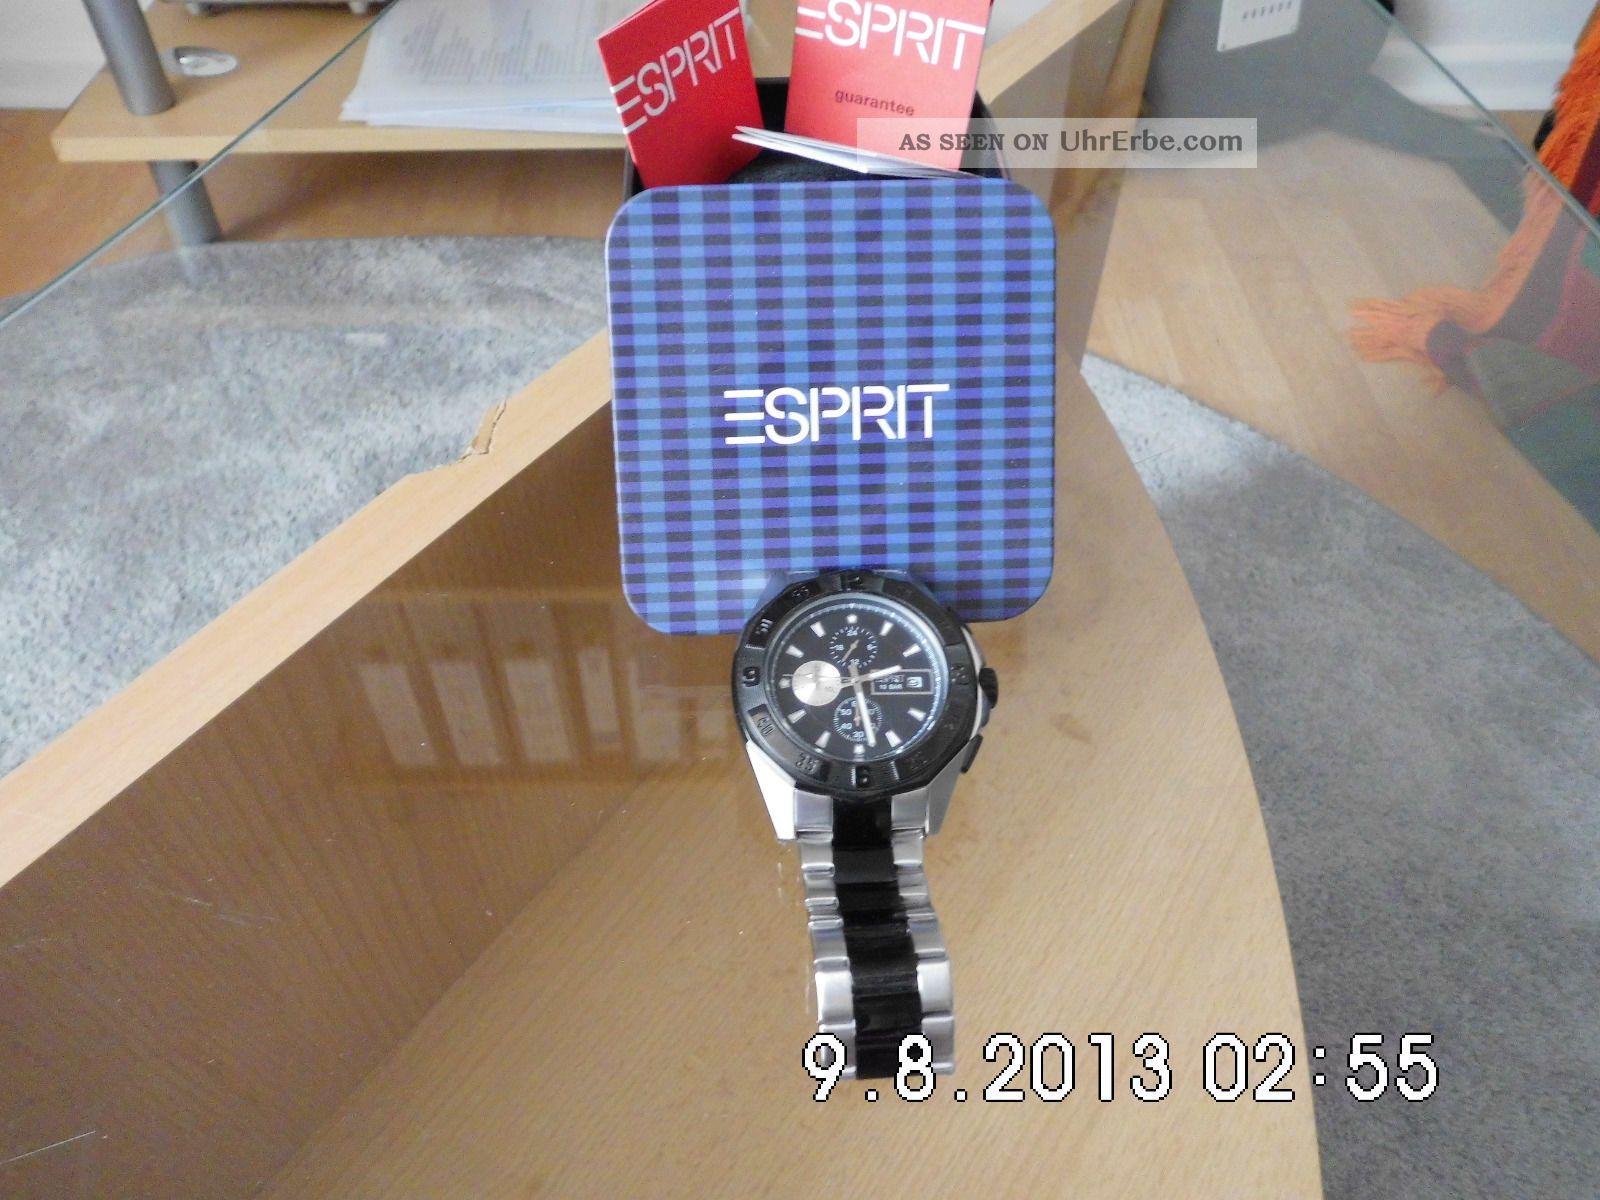 Esprit Uhr Armbanduhren Bild